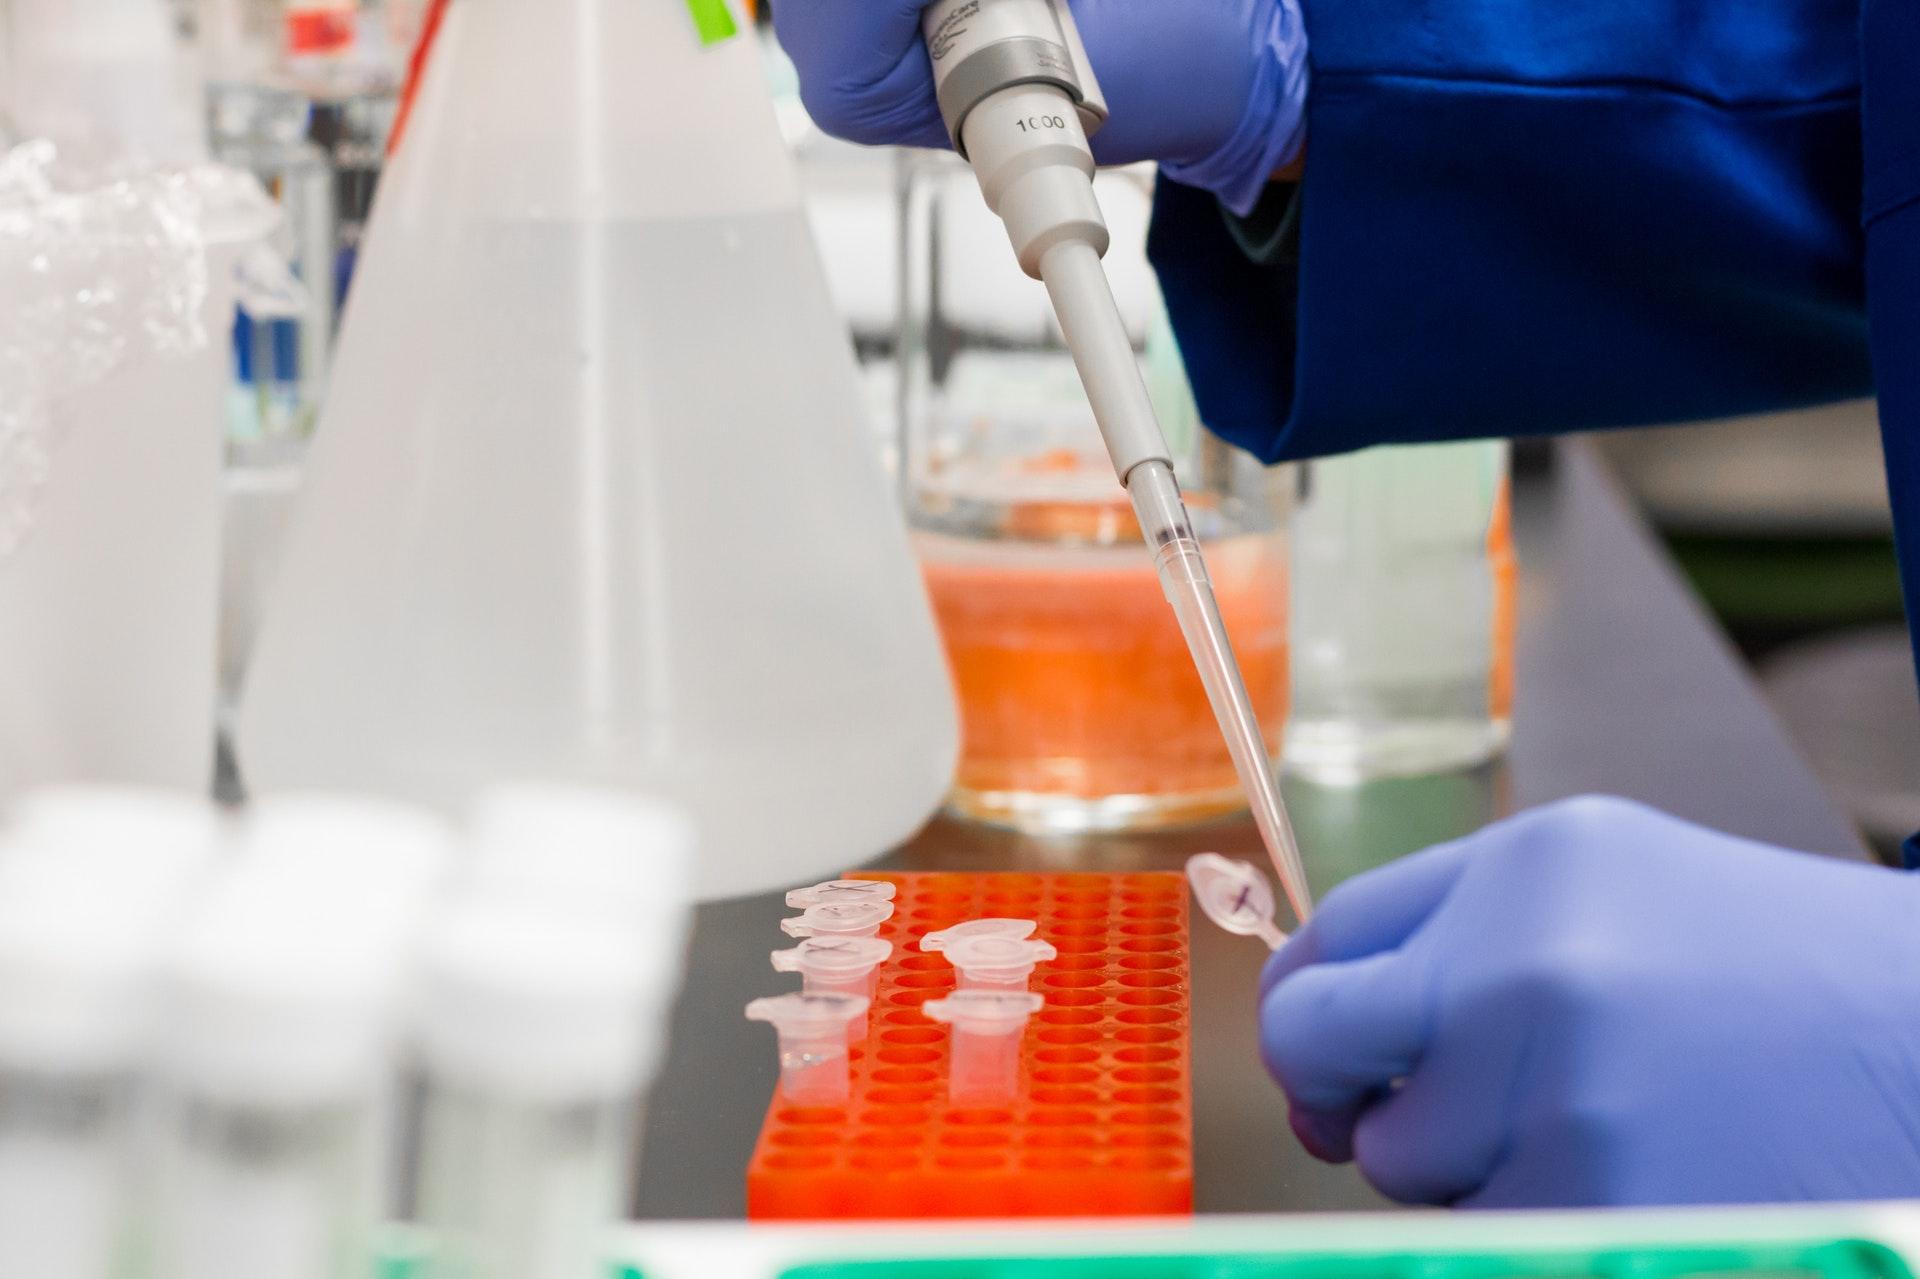 scientist putting a drop in a test tube